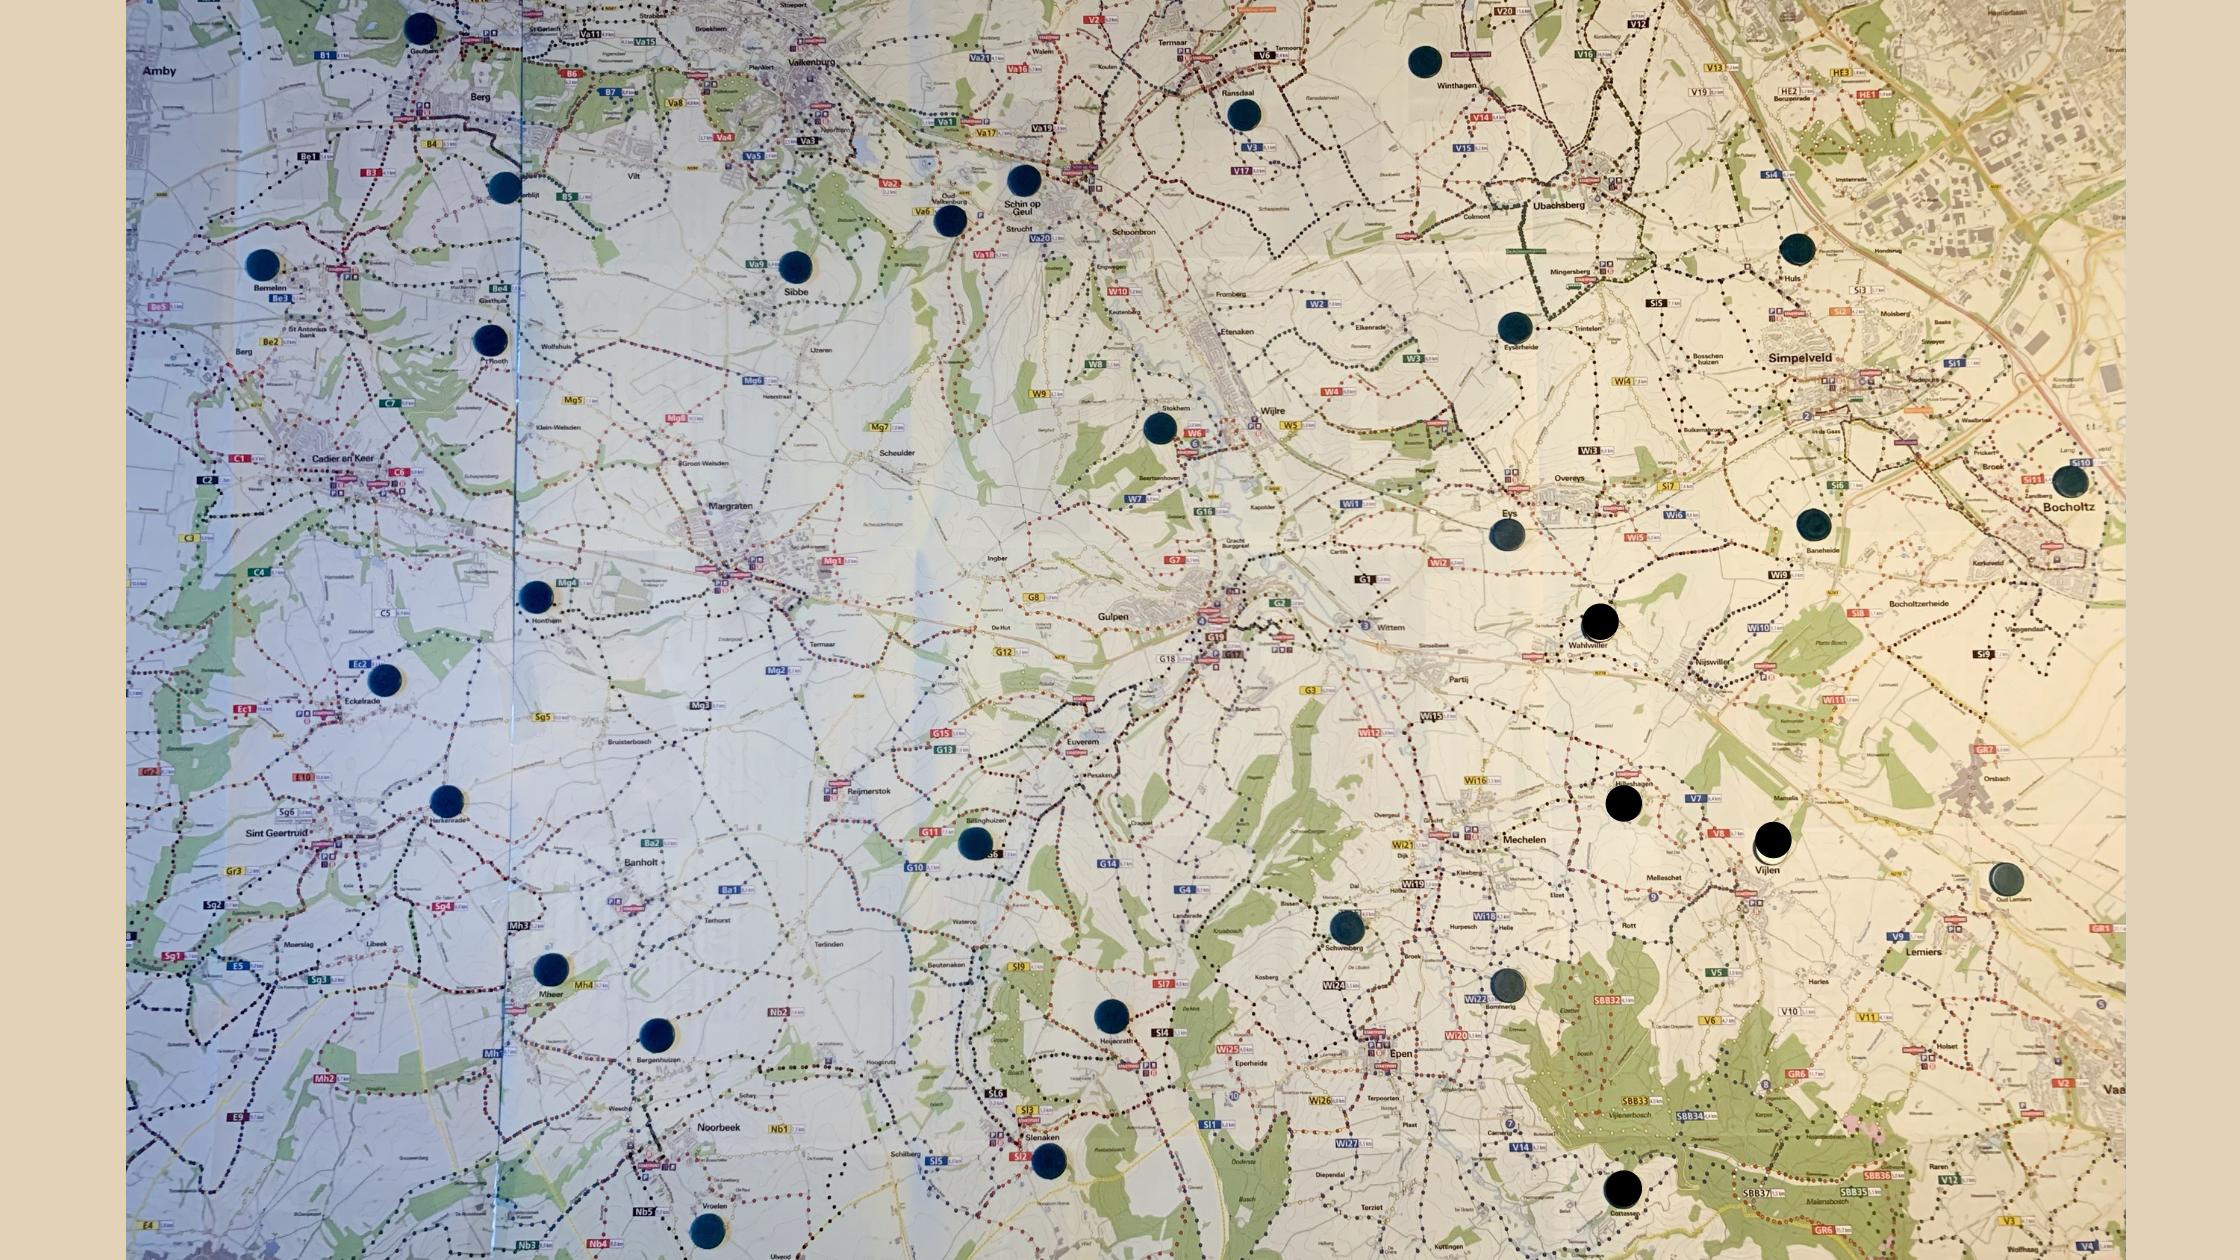 31 plekken die samen de Cammino della Fortuna vormen